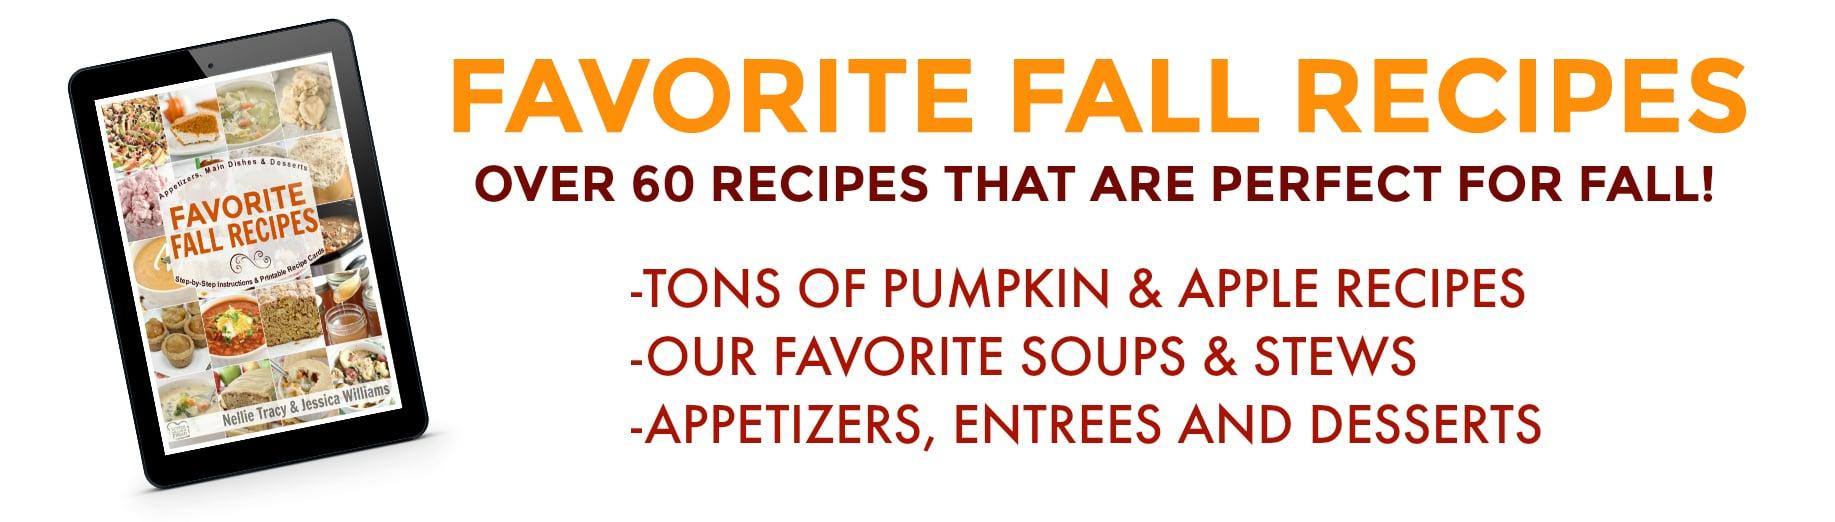 Favorite Fall Recipes Details